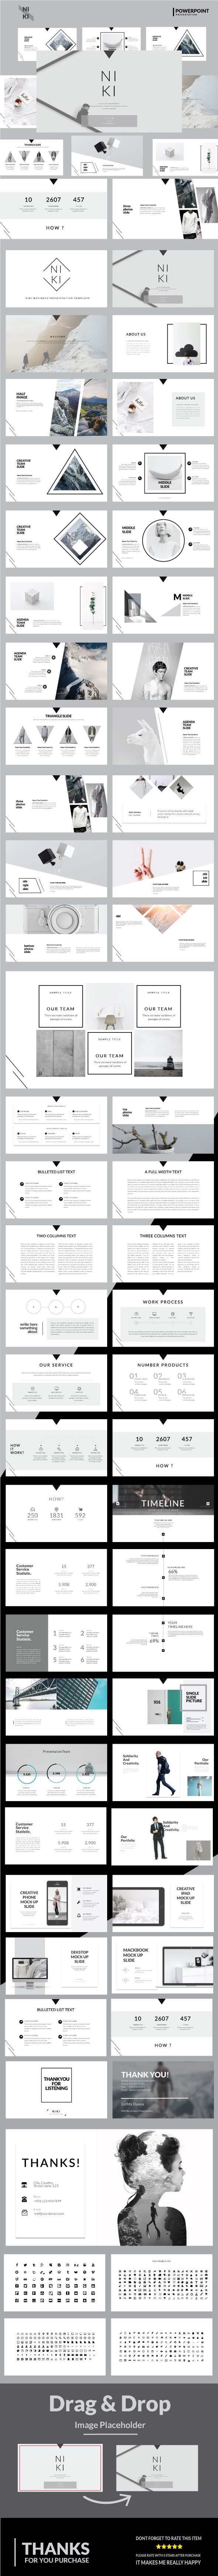 Niki multipurpose powerpoint template business powerpoint niki multipurpose powerpoint template business powerpoint templates download here https toneelgroepblik Image collections